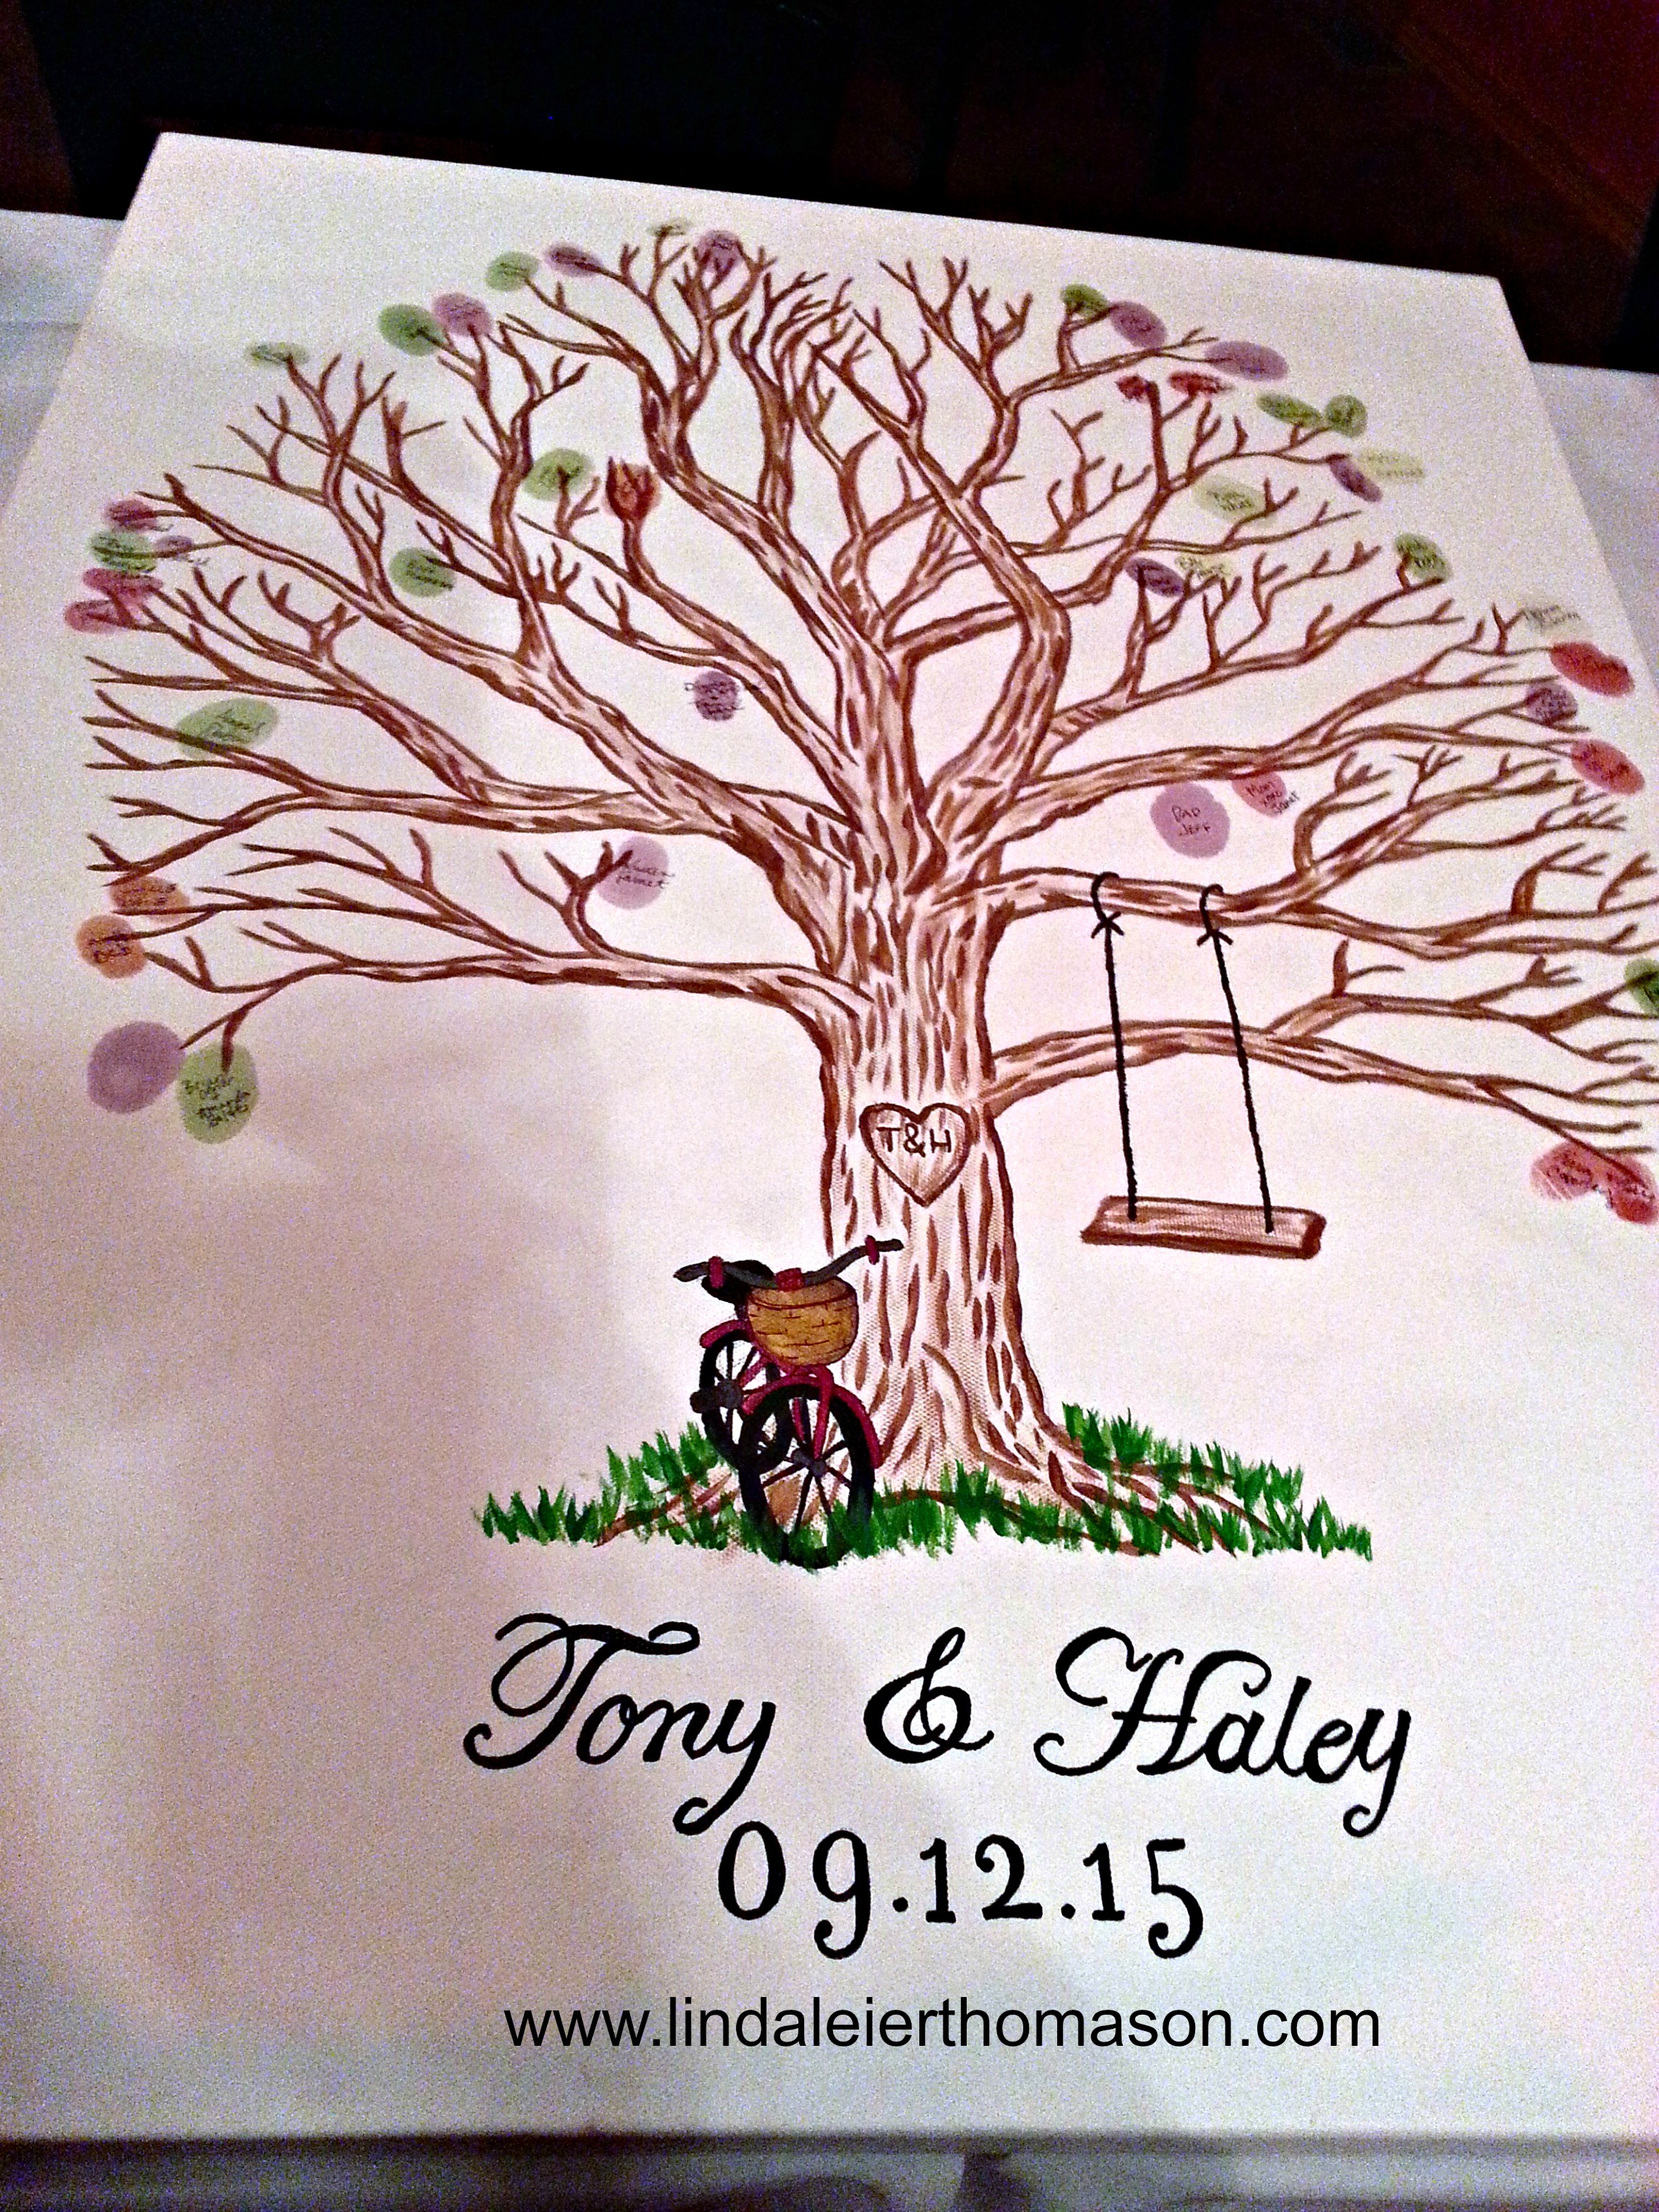 Wisconsin Sept 2015 inc Haley wedding 059